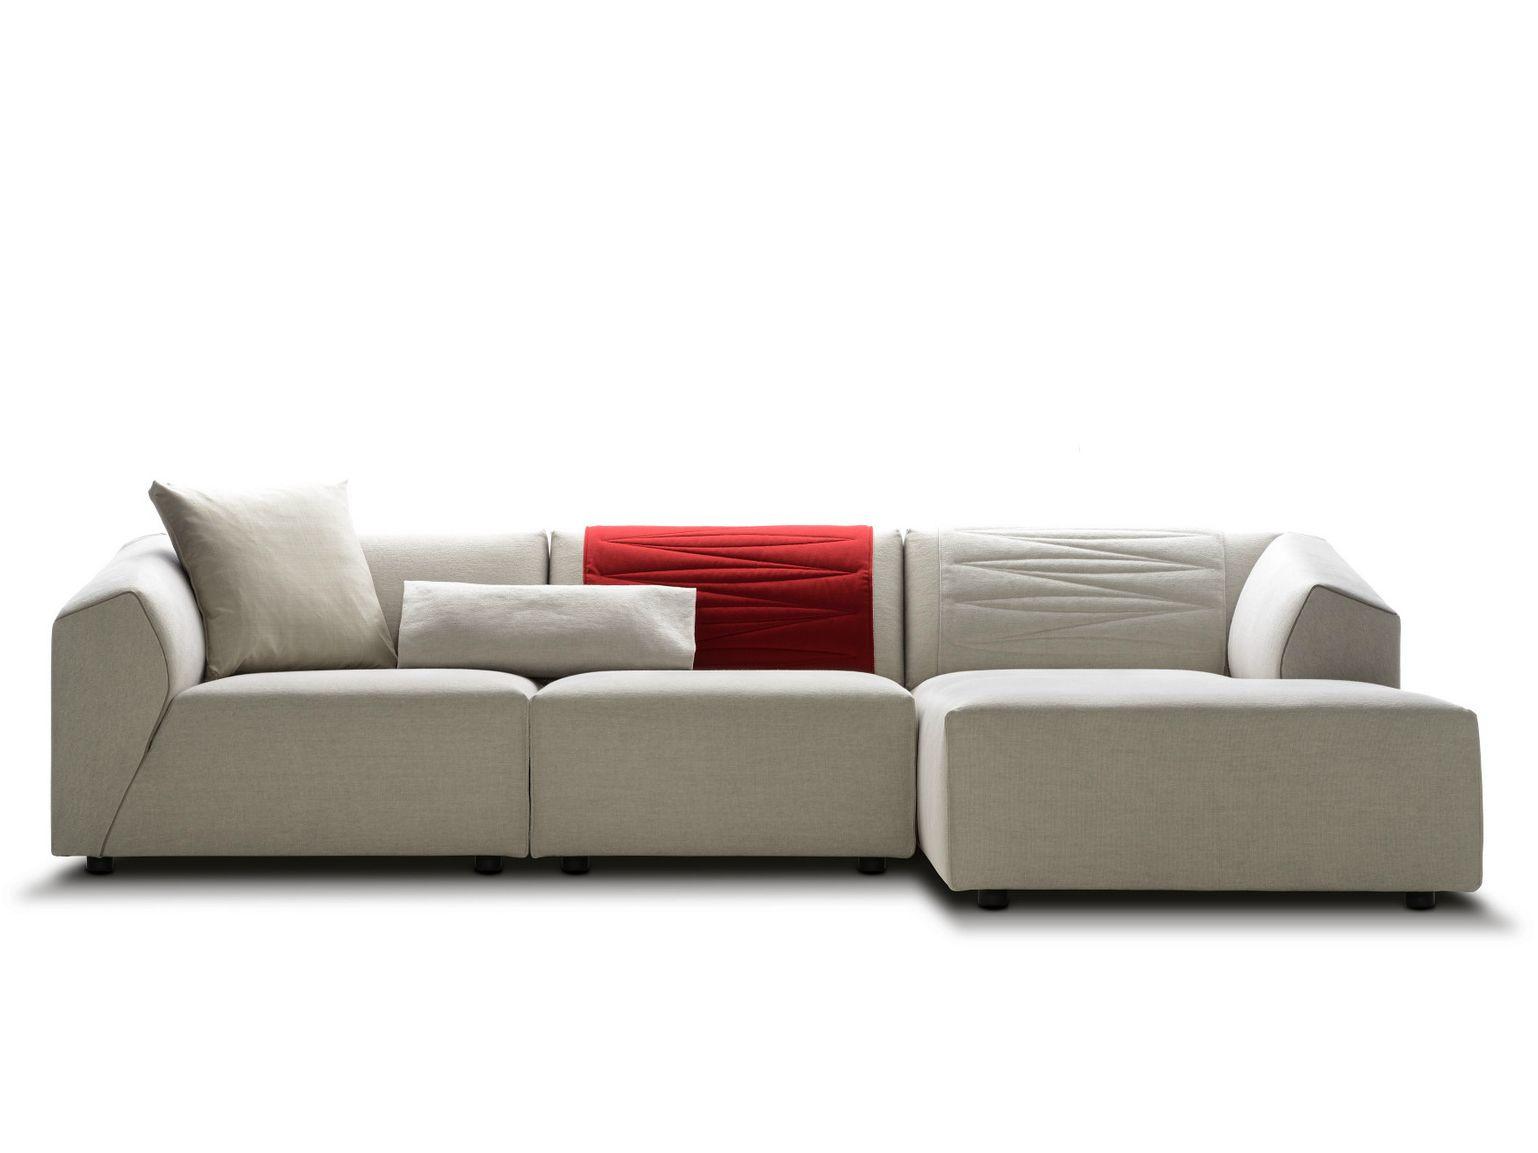 THEA Sofa with chaise longue by MDF Italia design Lina Obregon ...